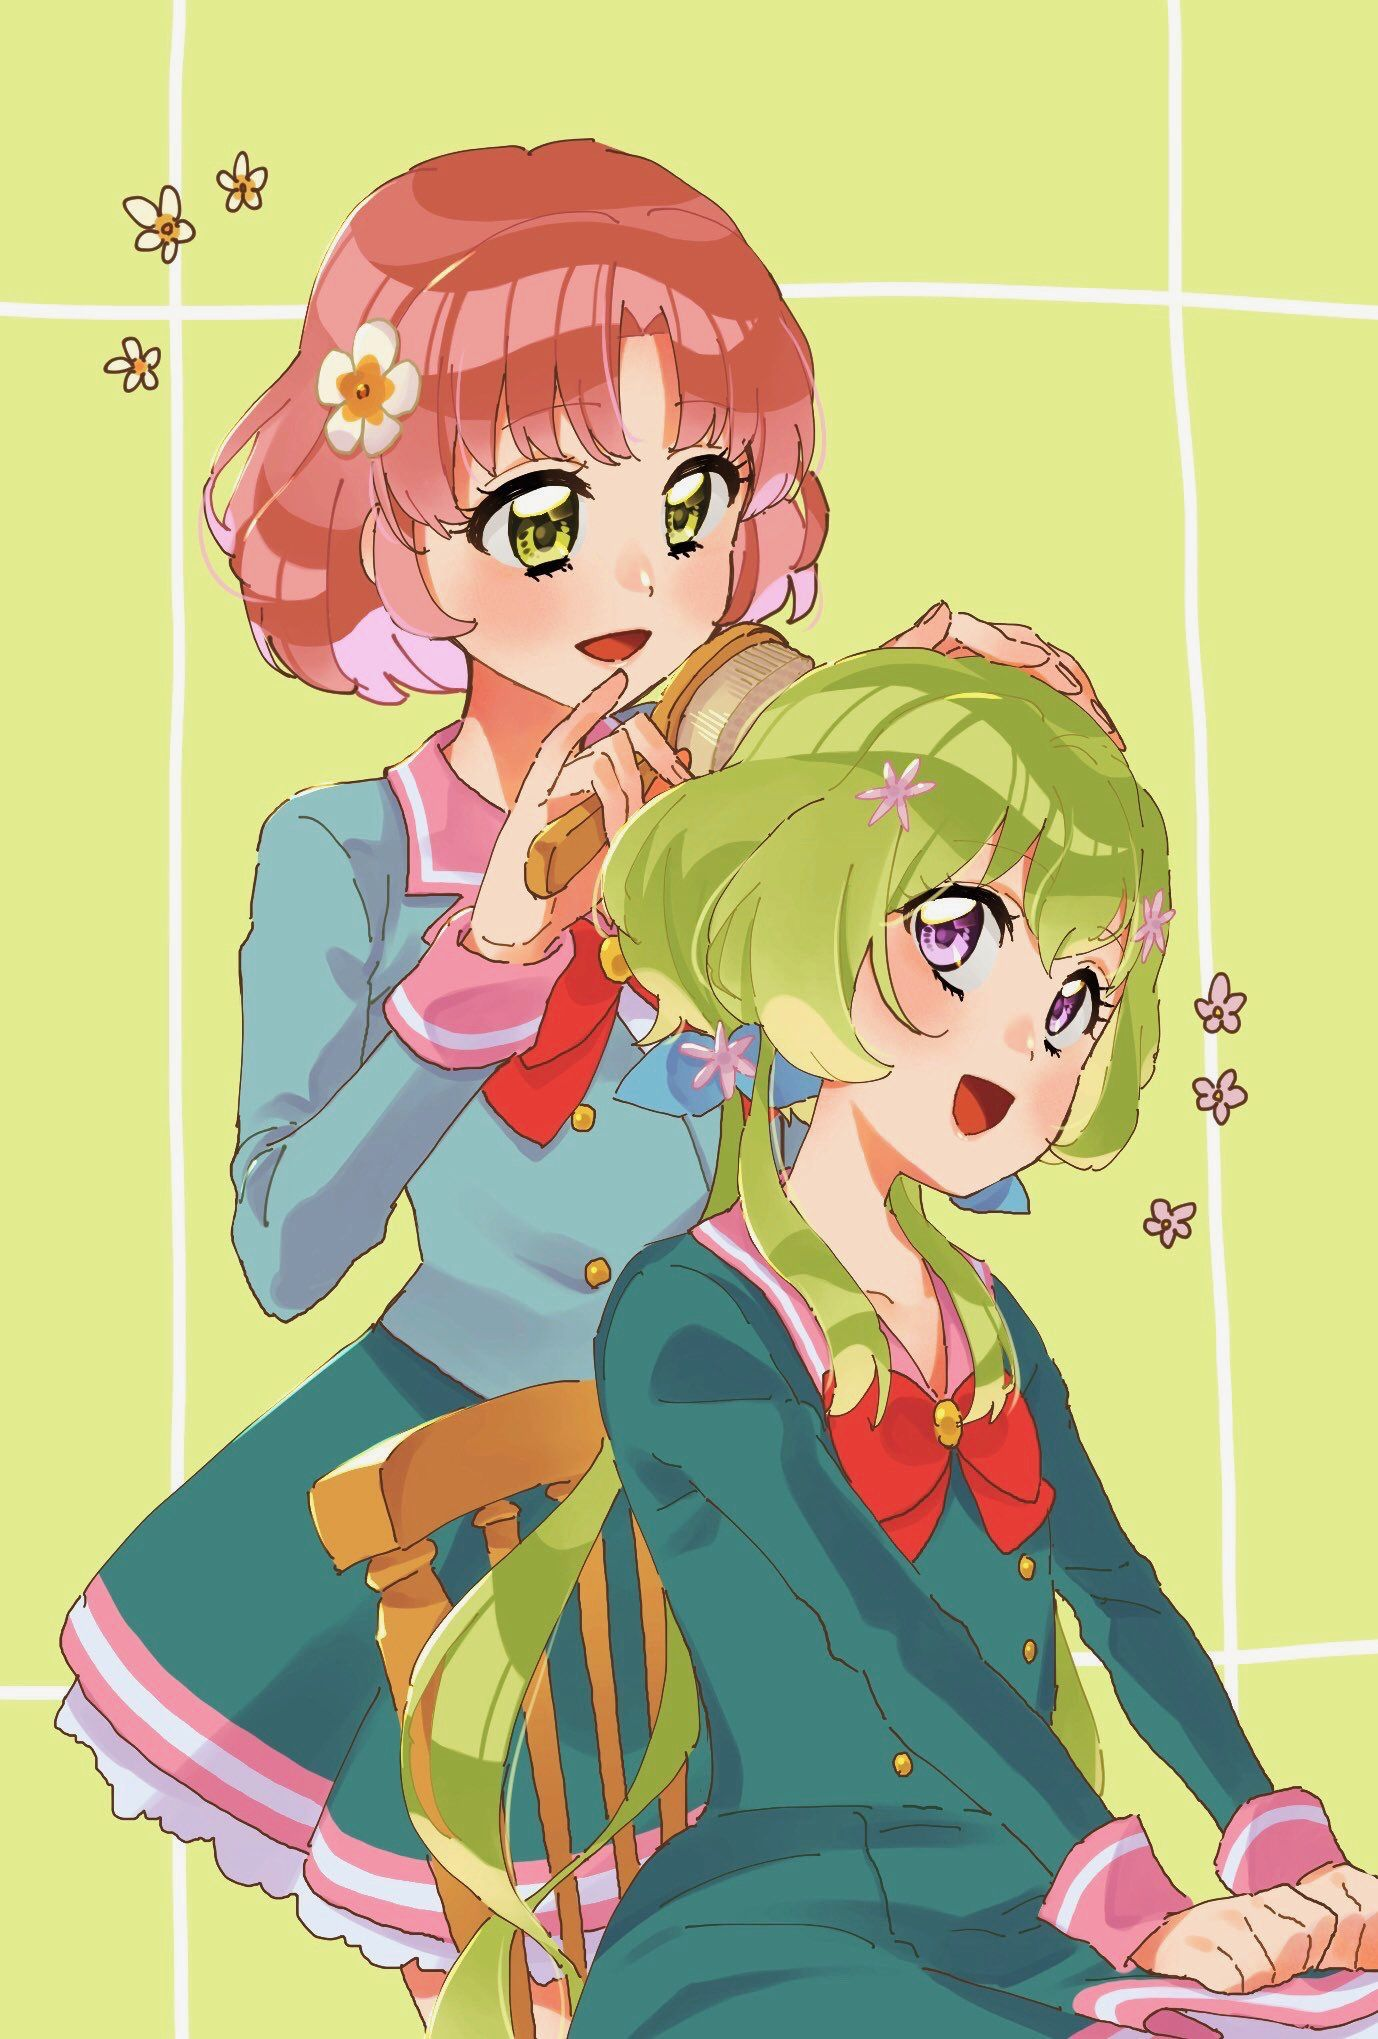 Pin by Joud on Aikatsu! Zelda characters, Anime, Character